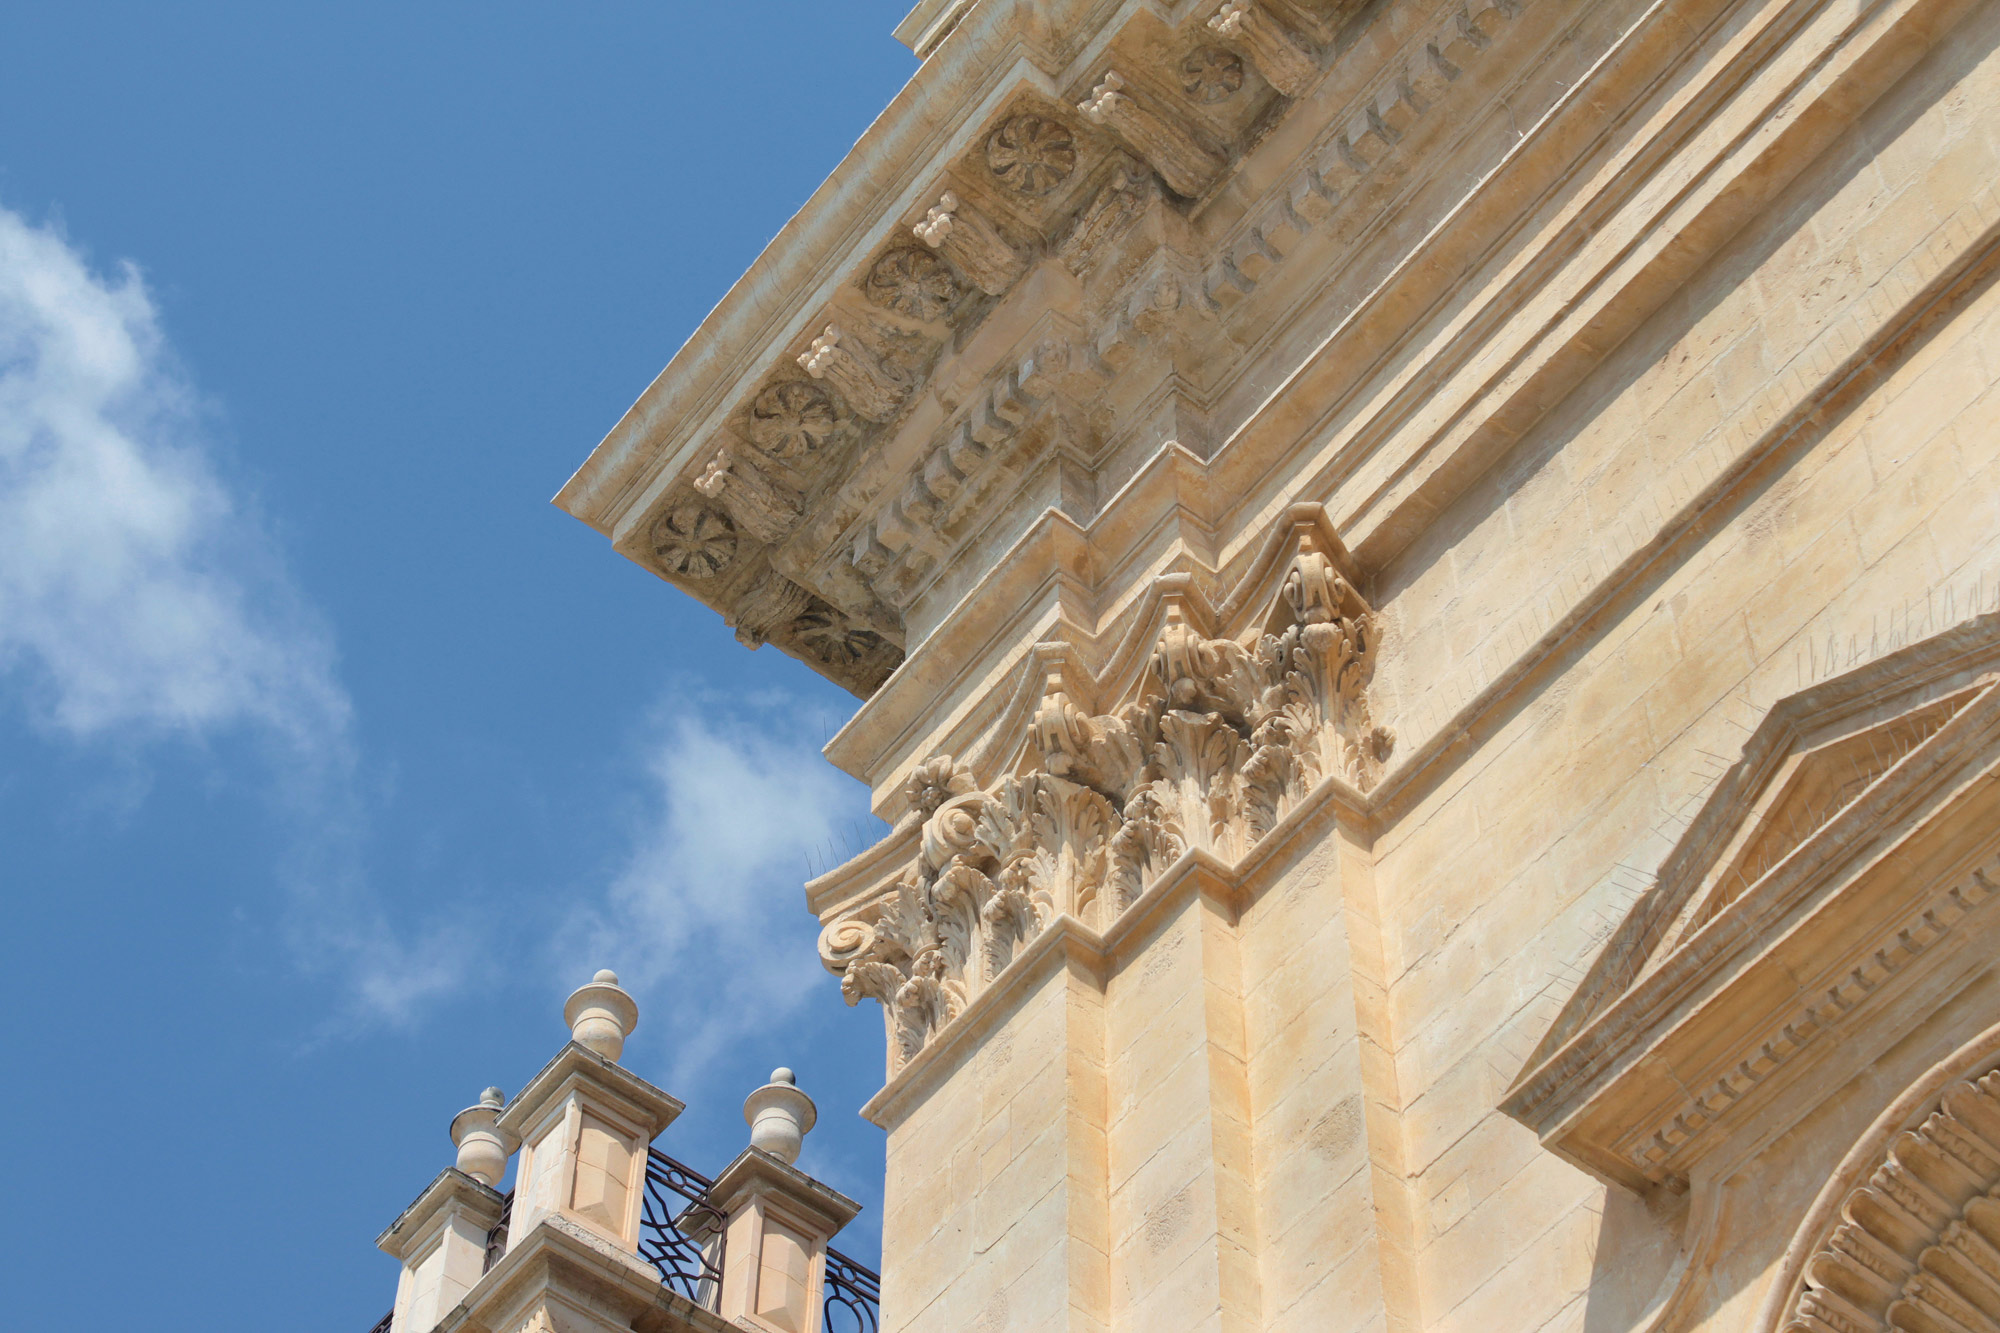 Barock Architektur Detail